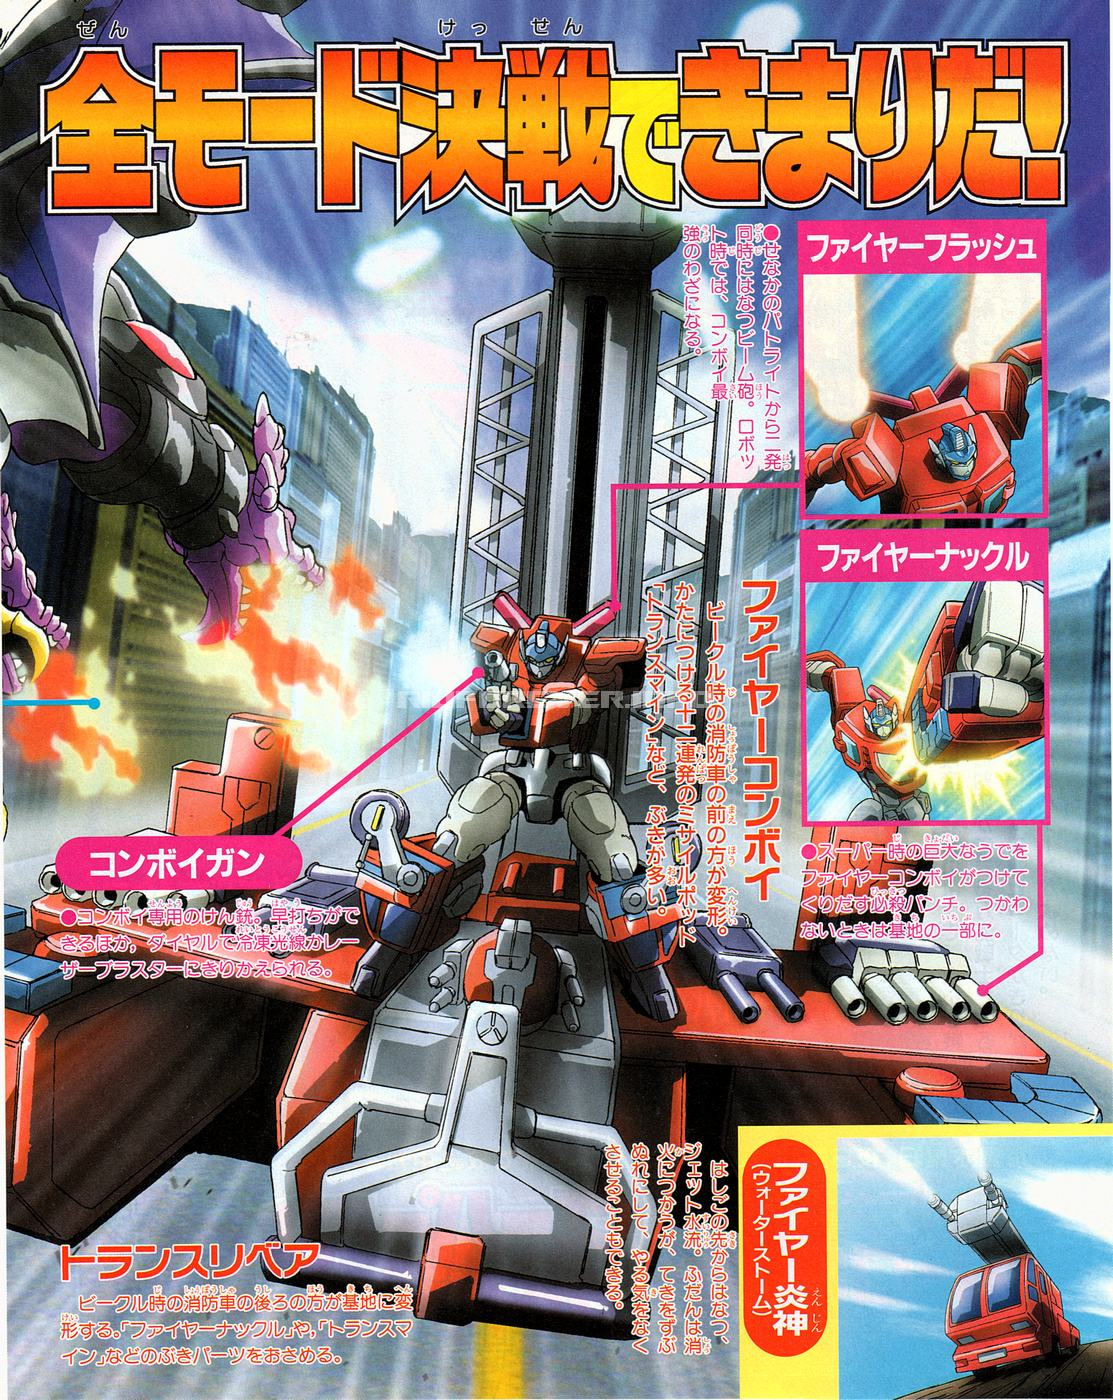 TV Magazine 2000-06-14-1